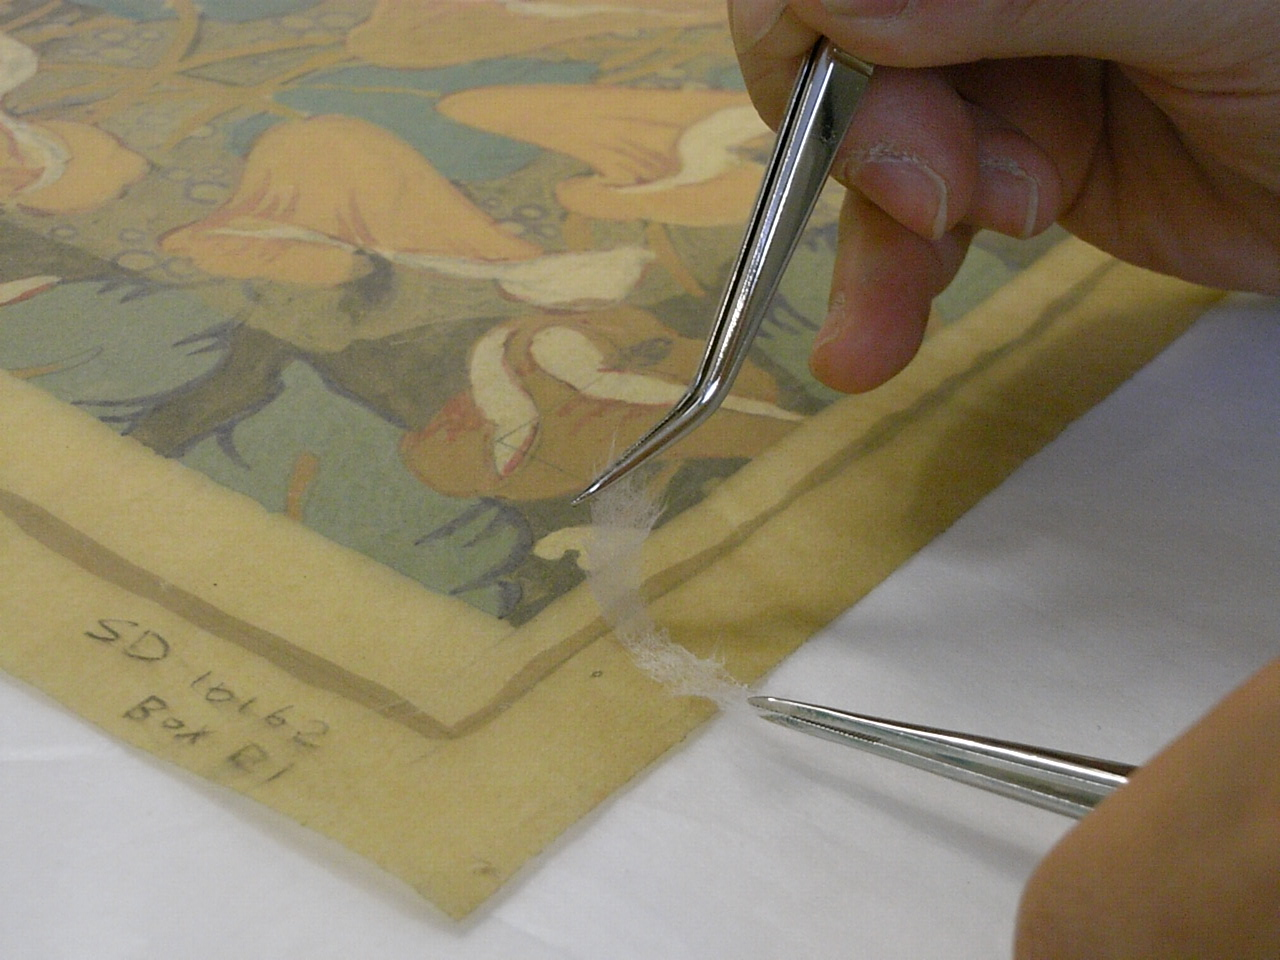 Photo of hands holding tweezers doing conservation work